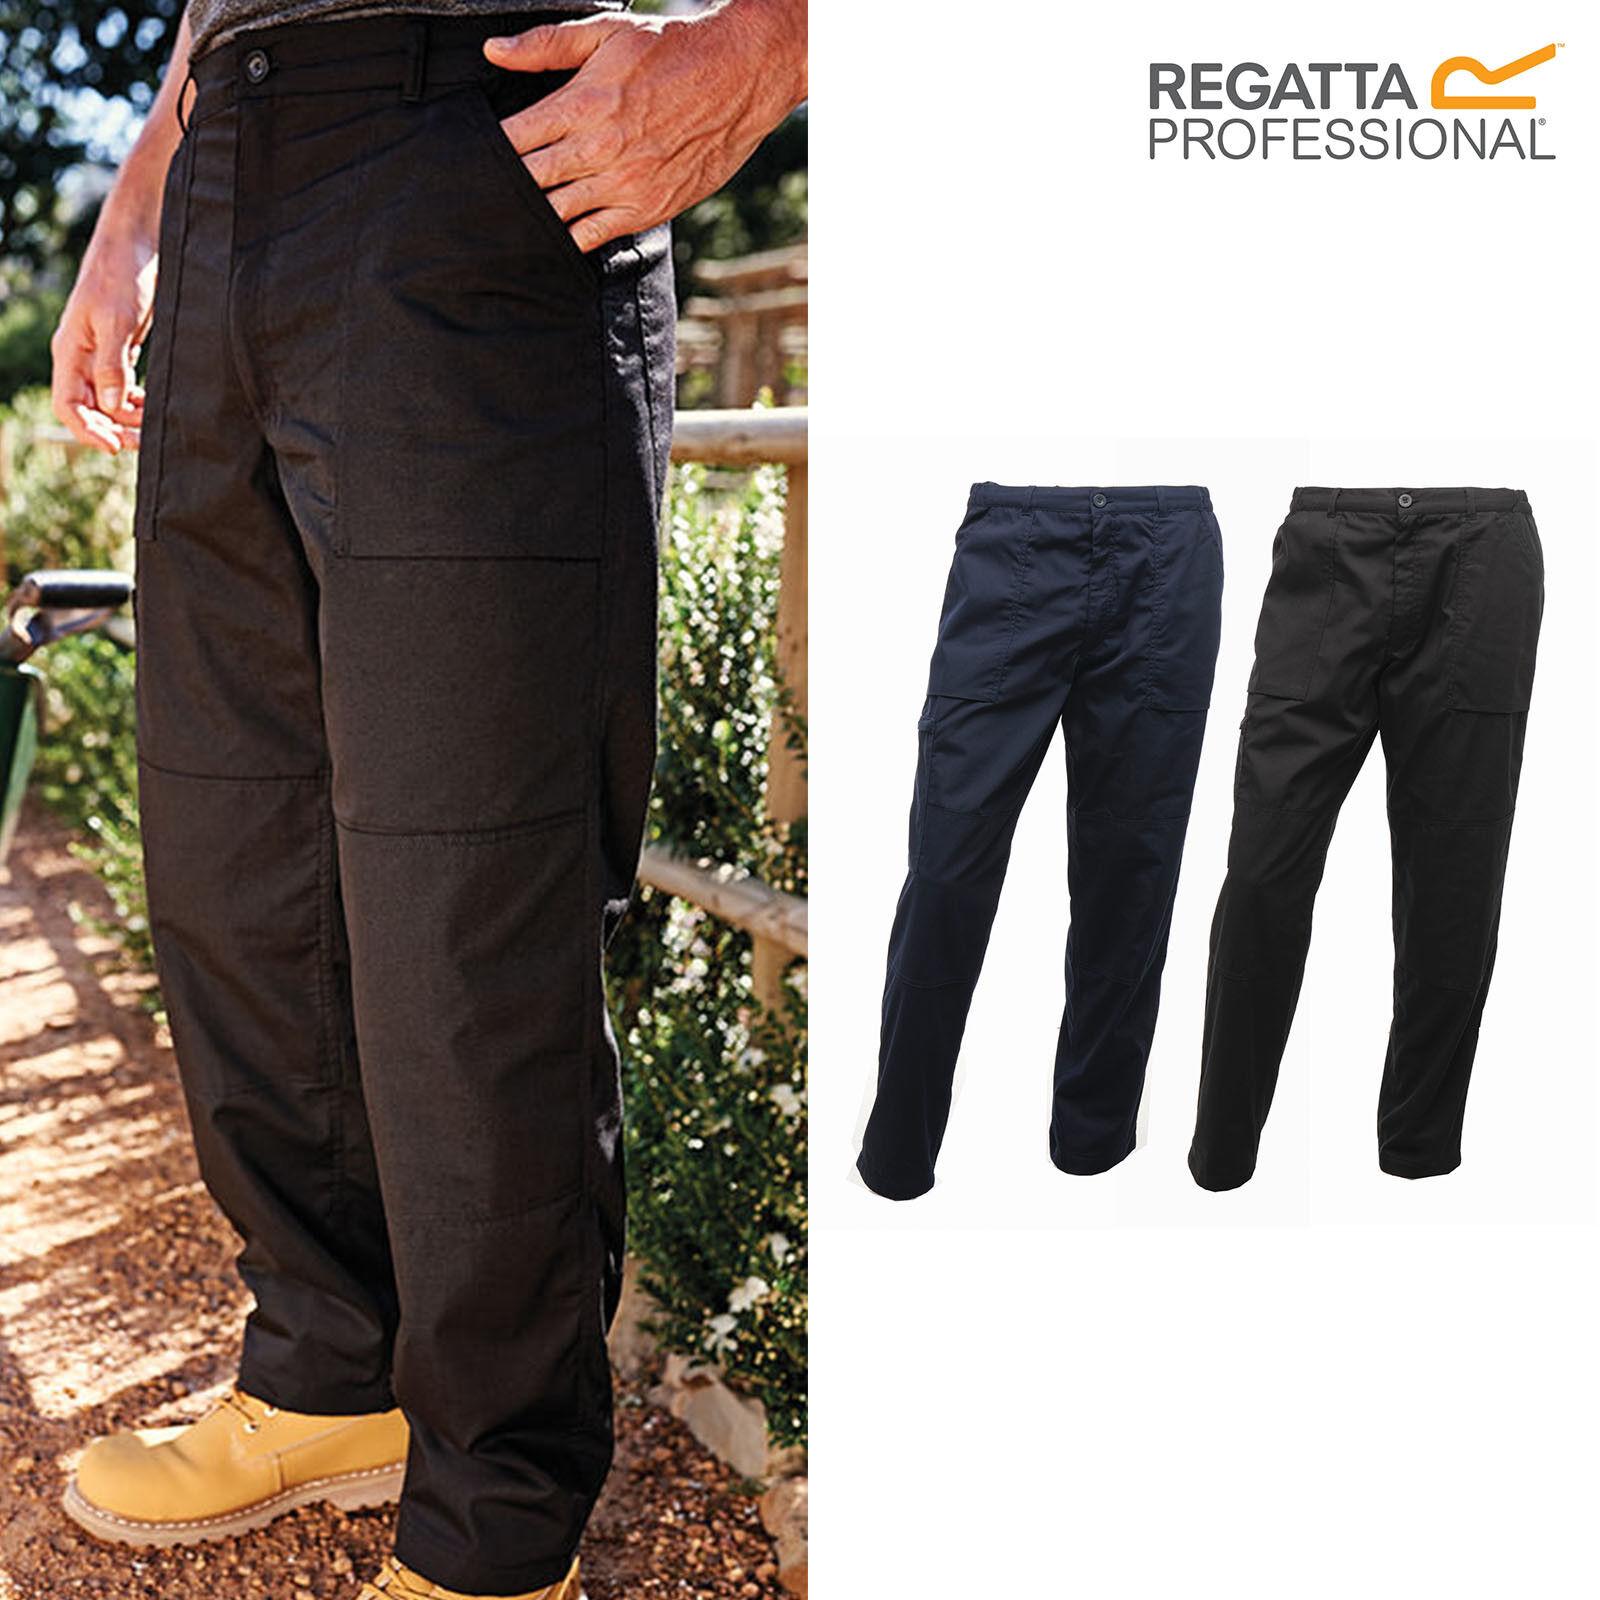 Regatta Professional Lined Action Trousers TRJ331